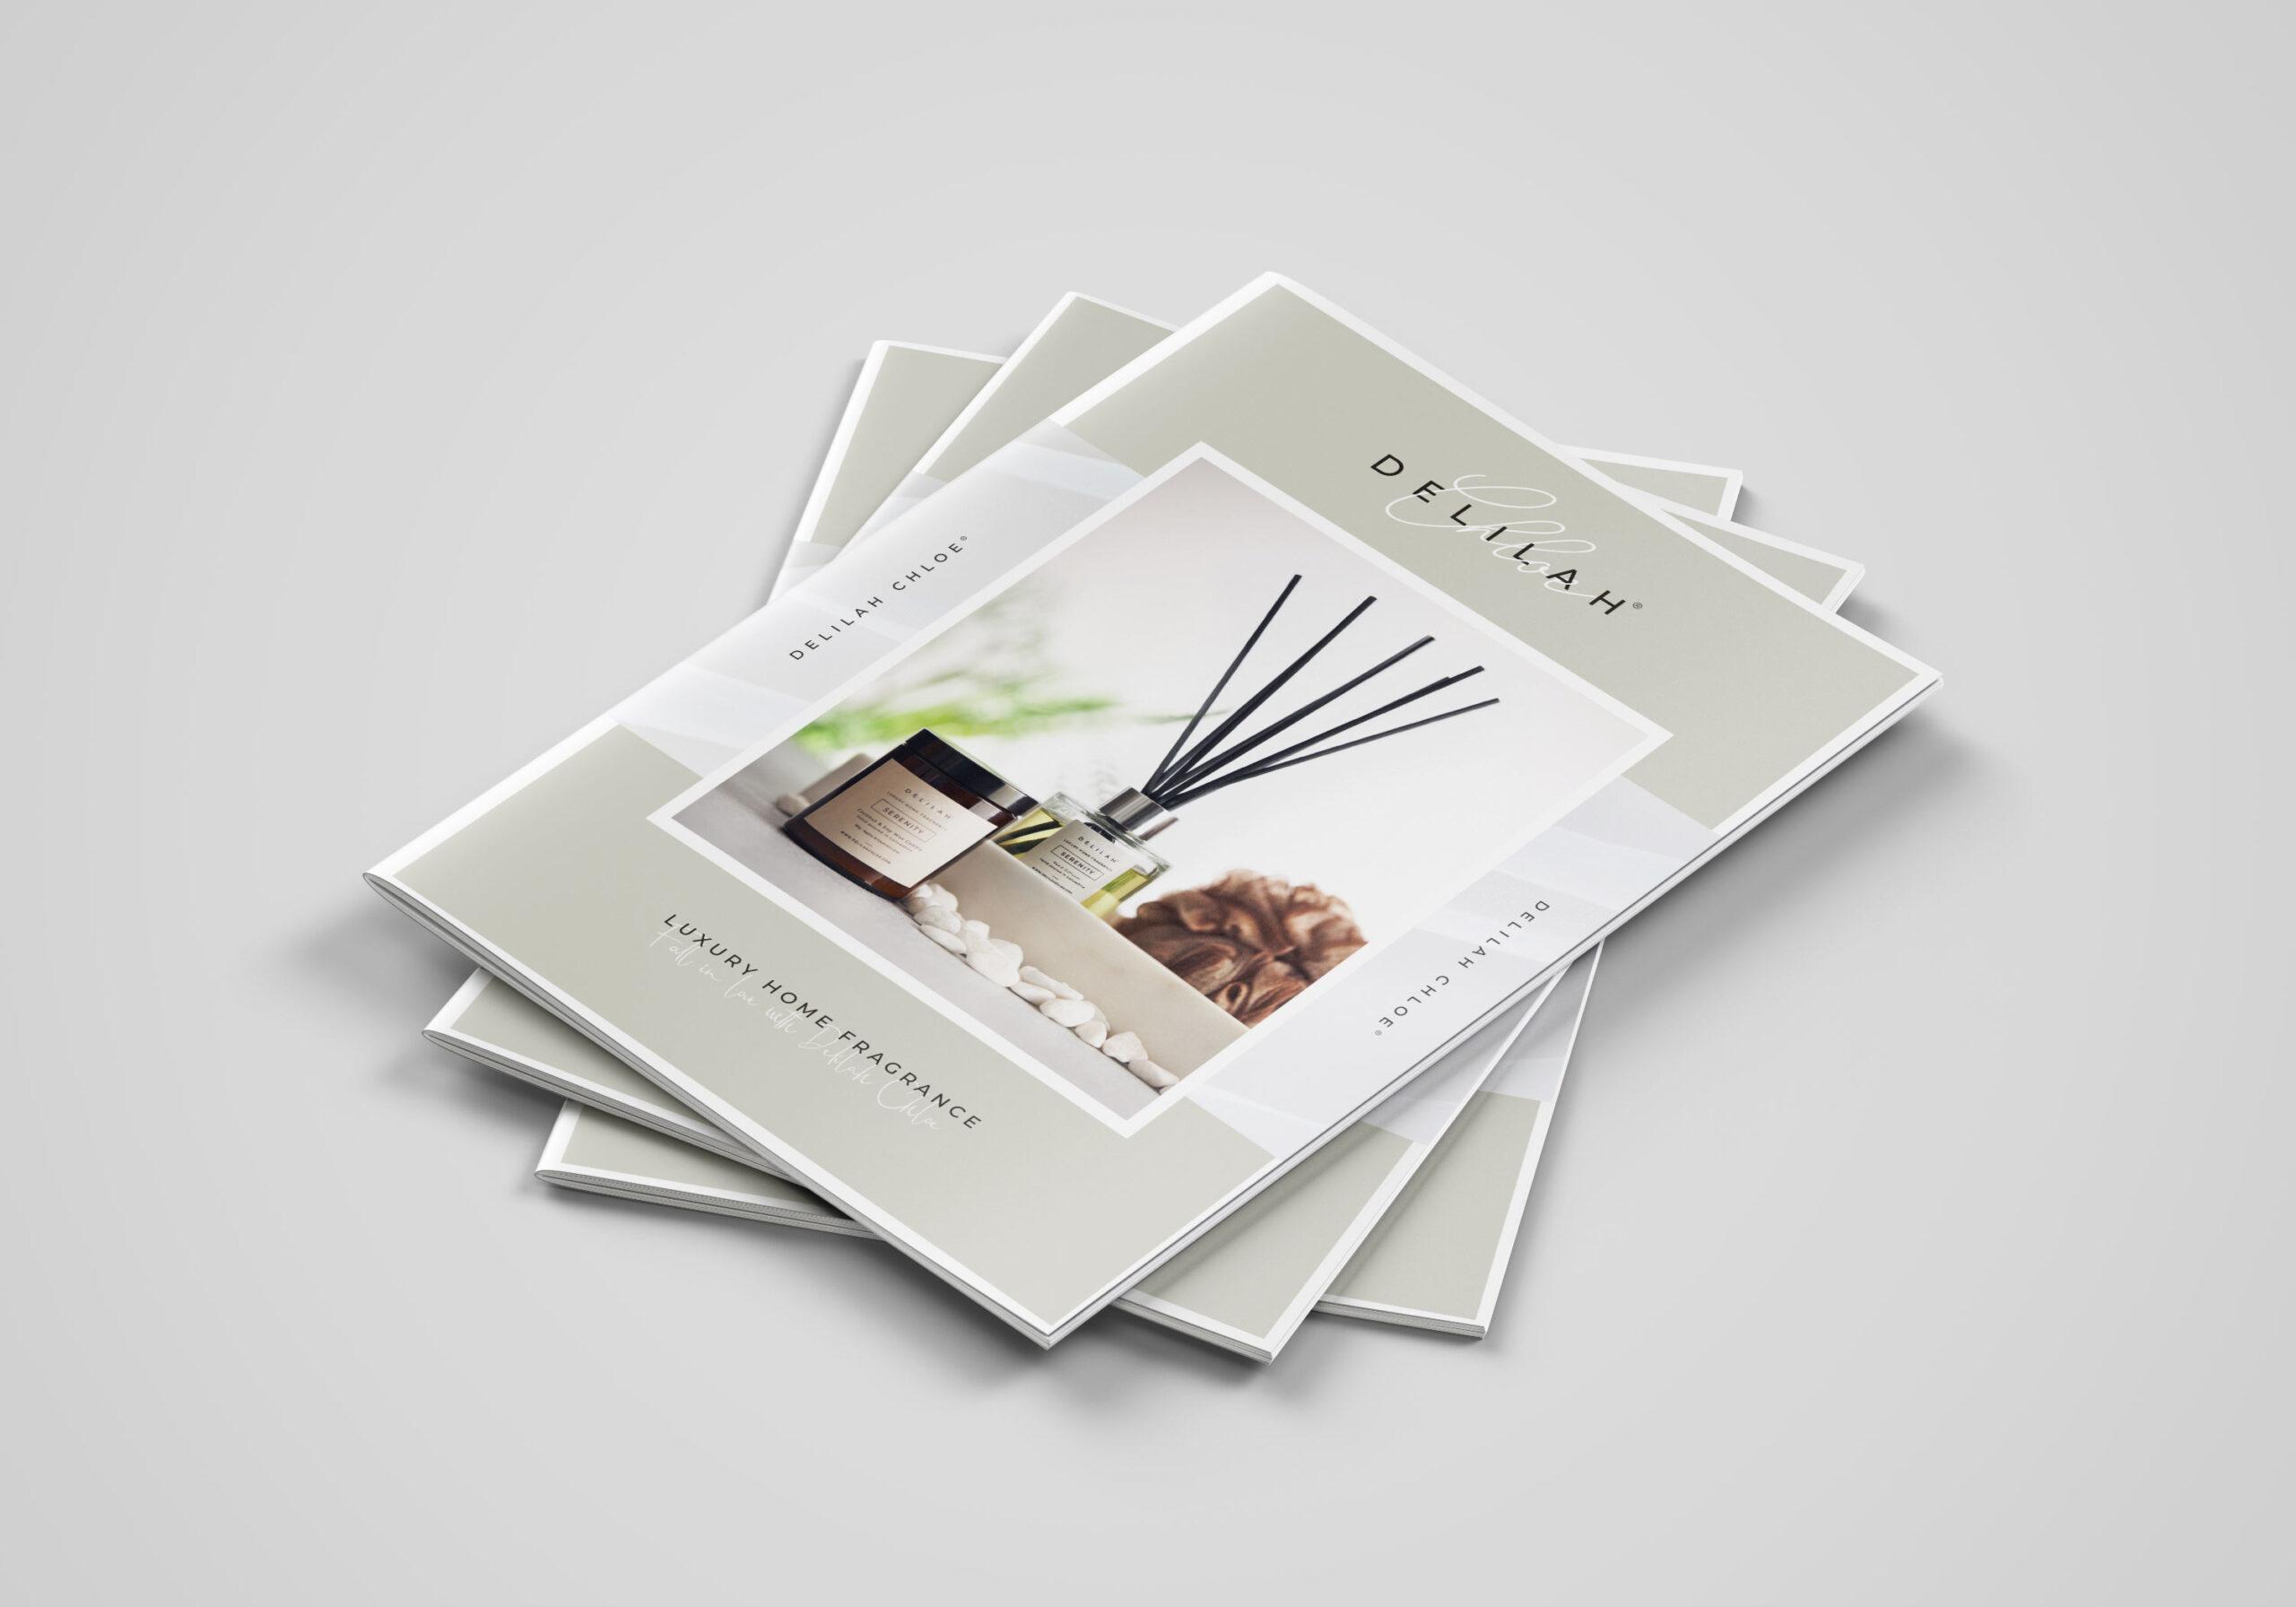 Brochure Design Services Blackburn. Graphic Design by Very Vivid Digital Marketing